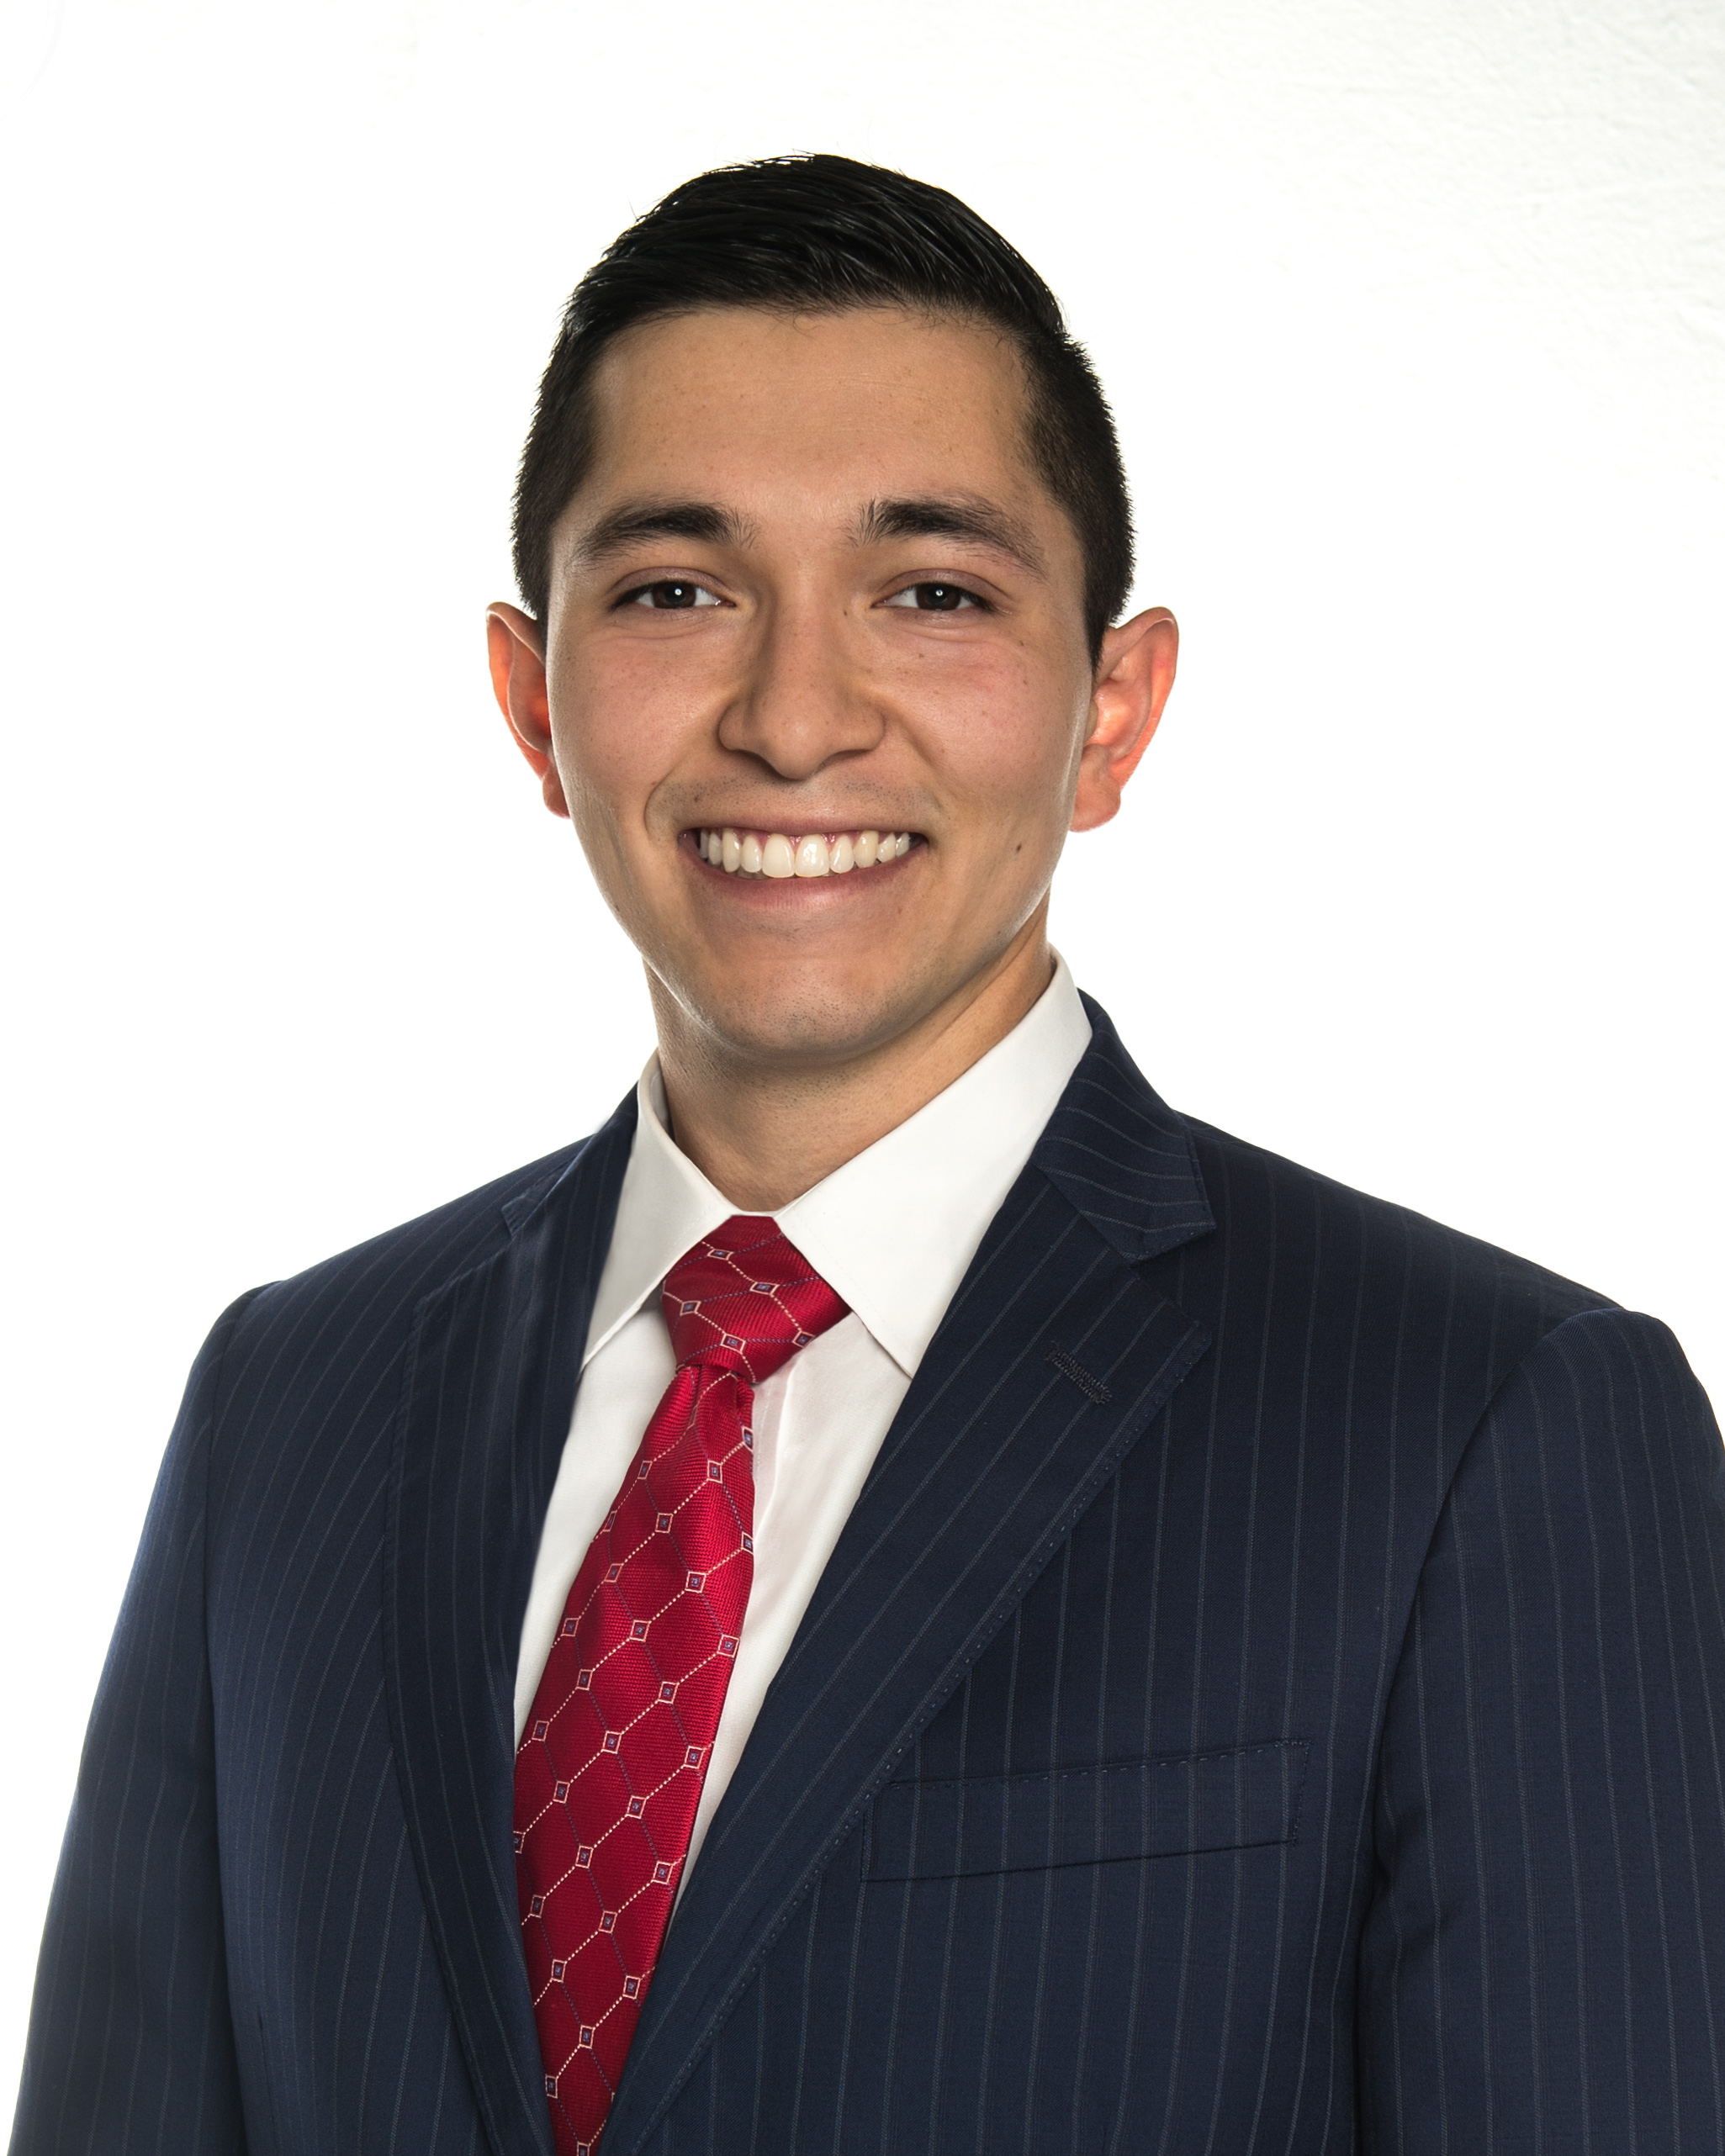 Christian Garcia - Madhouse Development